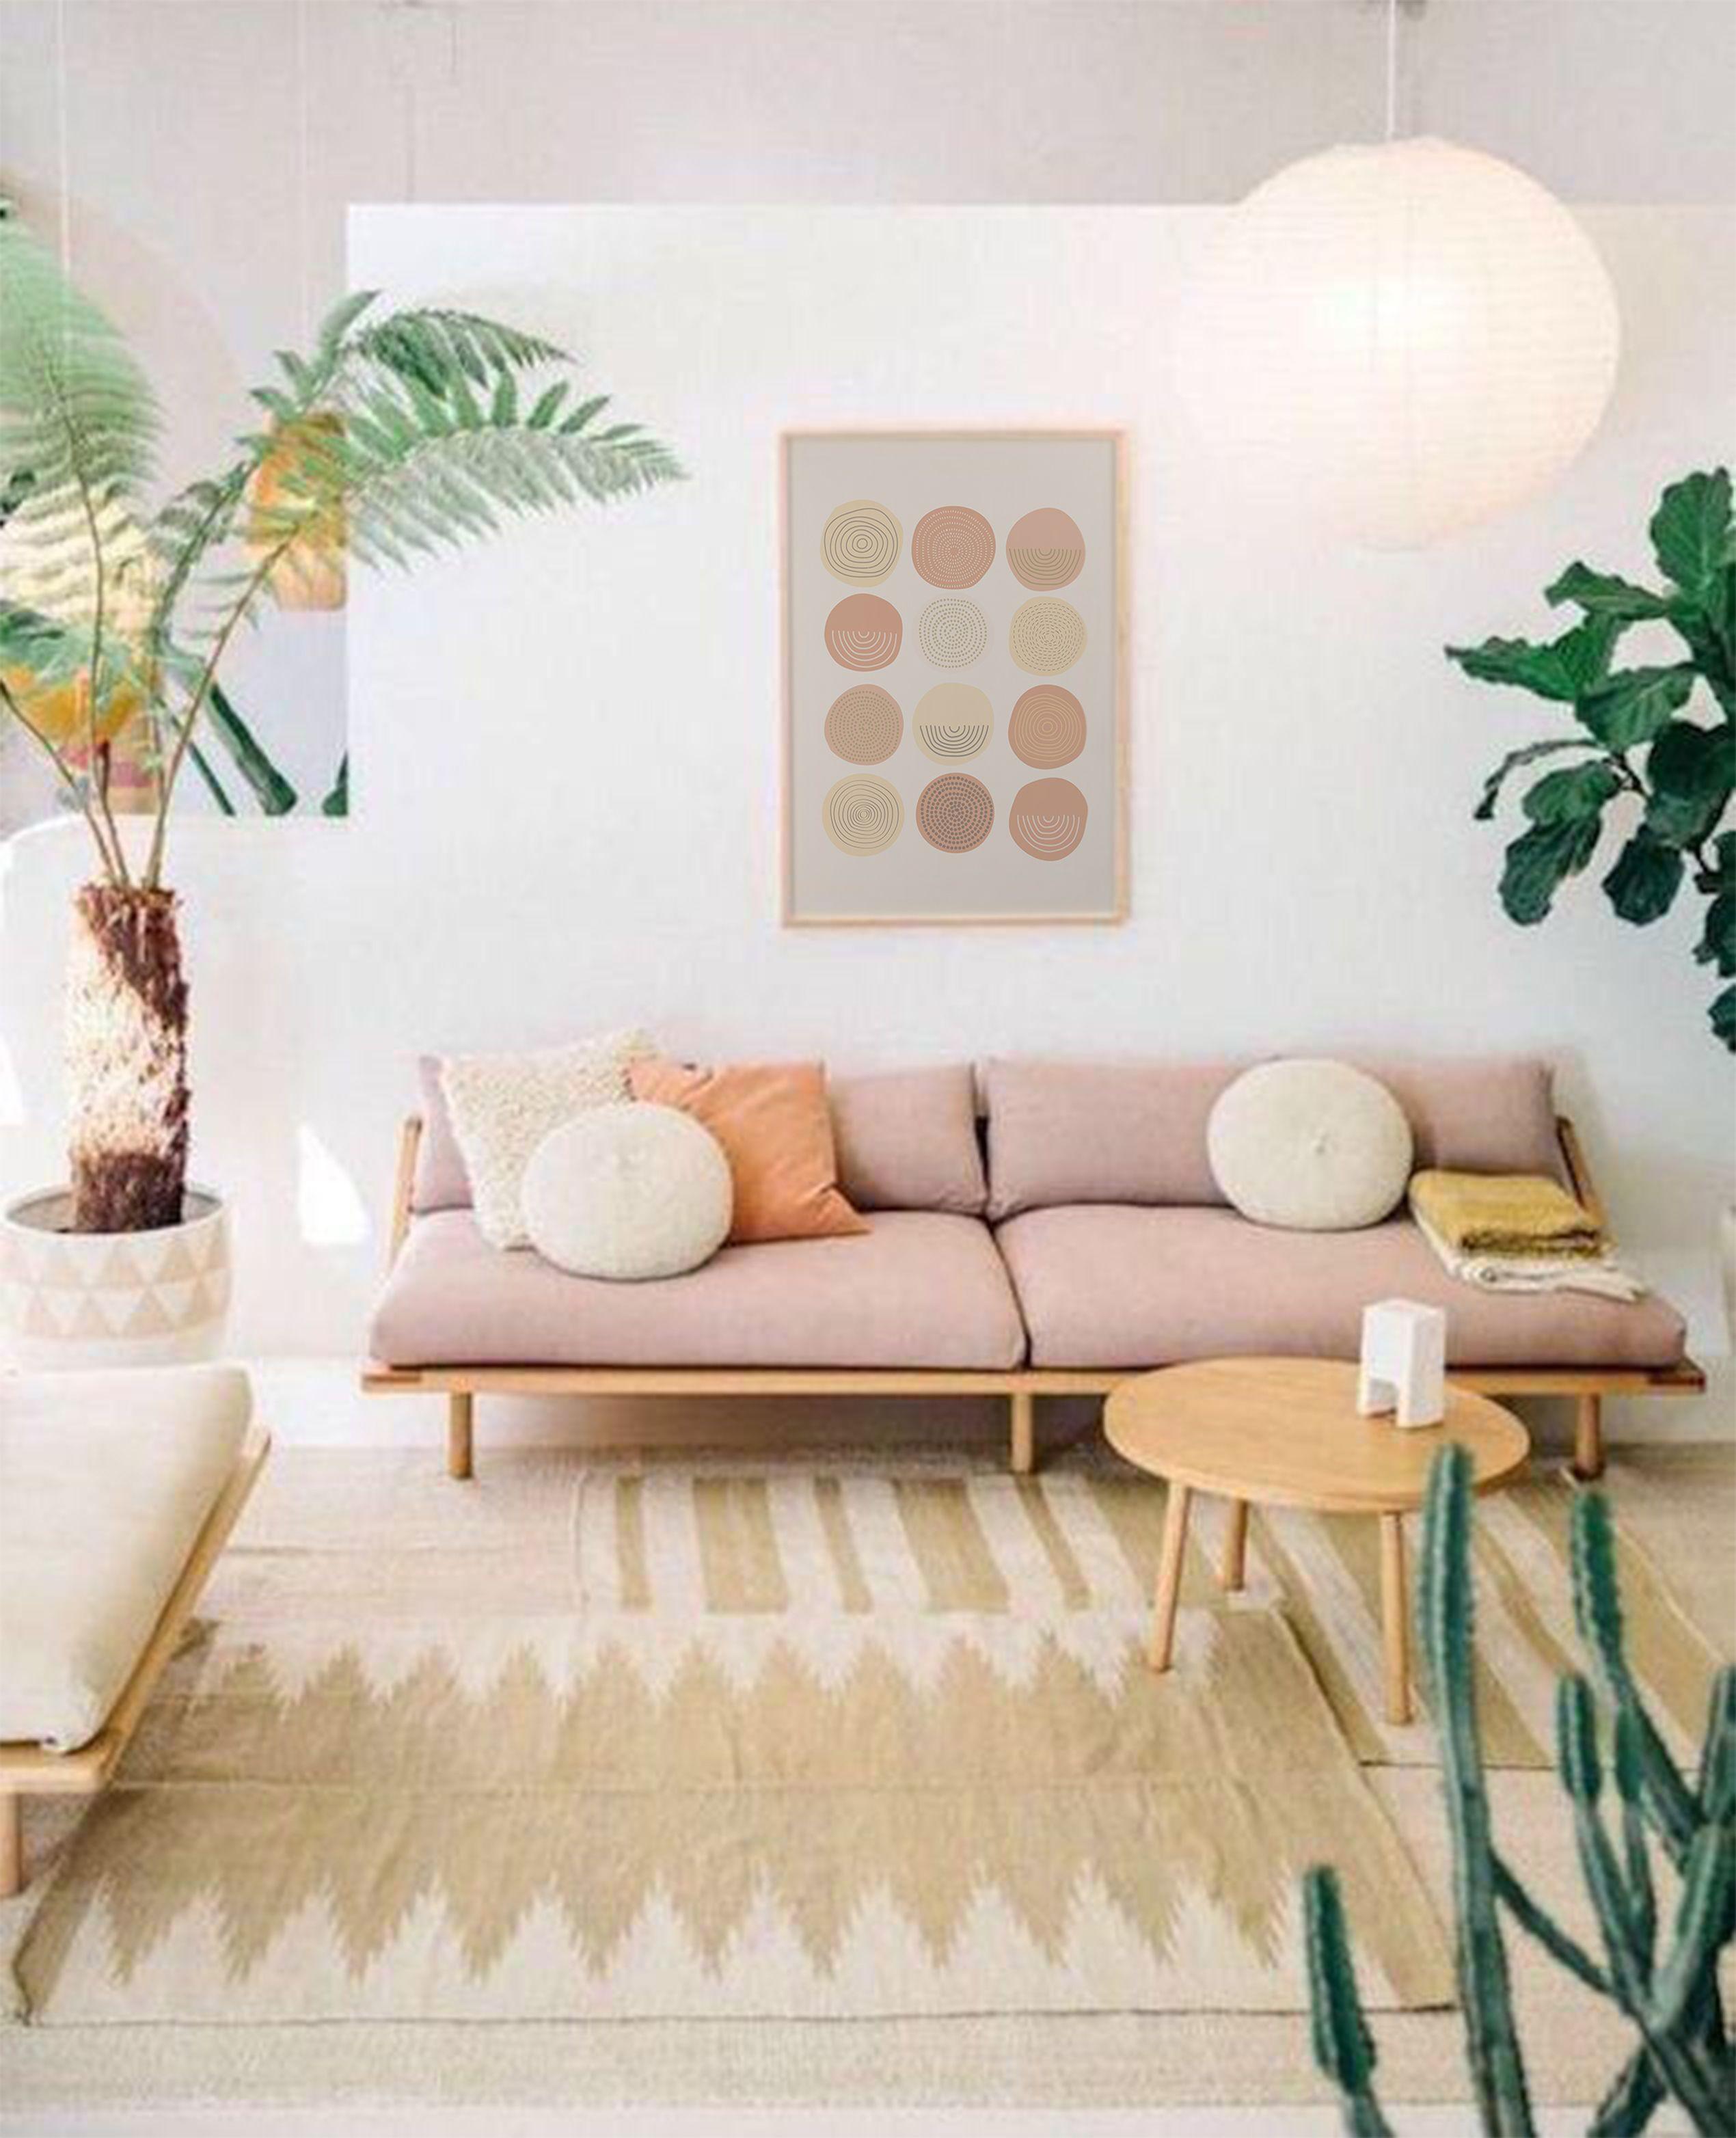 Abstract Circles Print Wall Art Apricot Printable Modern Minimal Wall Art Abstract Prin Small Living Room Decor Living Room Scandinavian Tropical Living Room Abstract living room decor